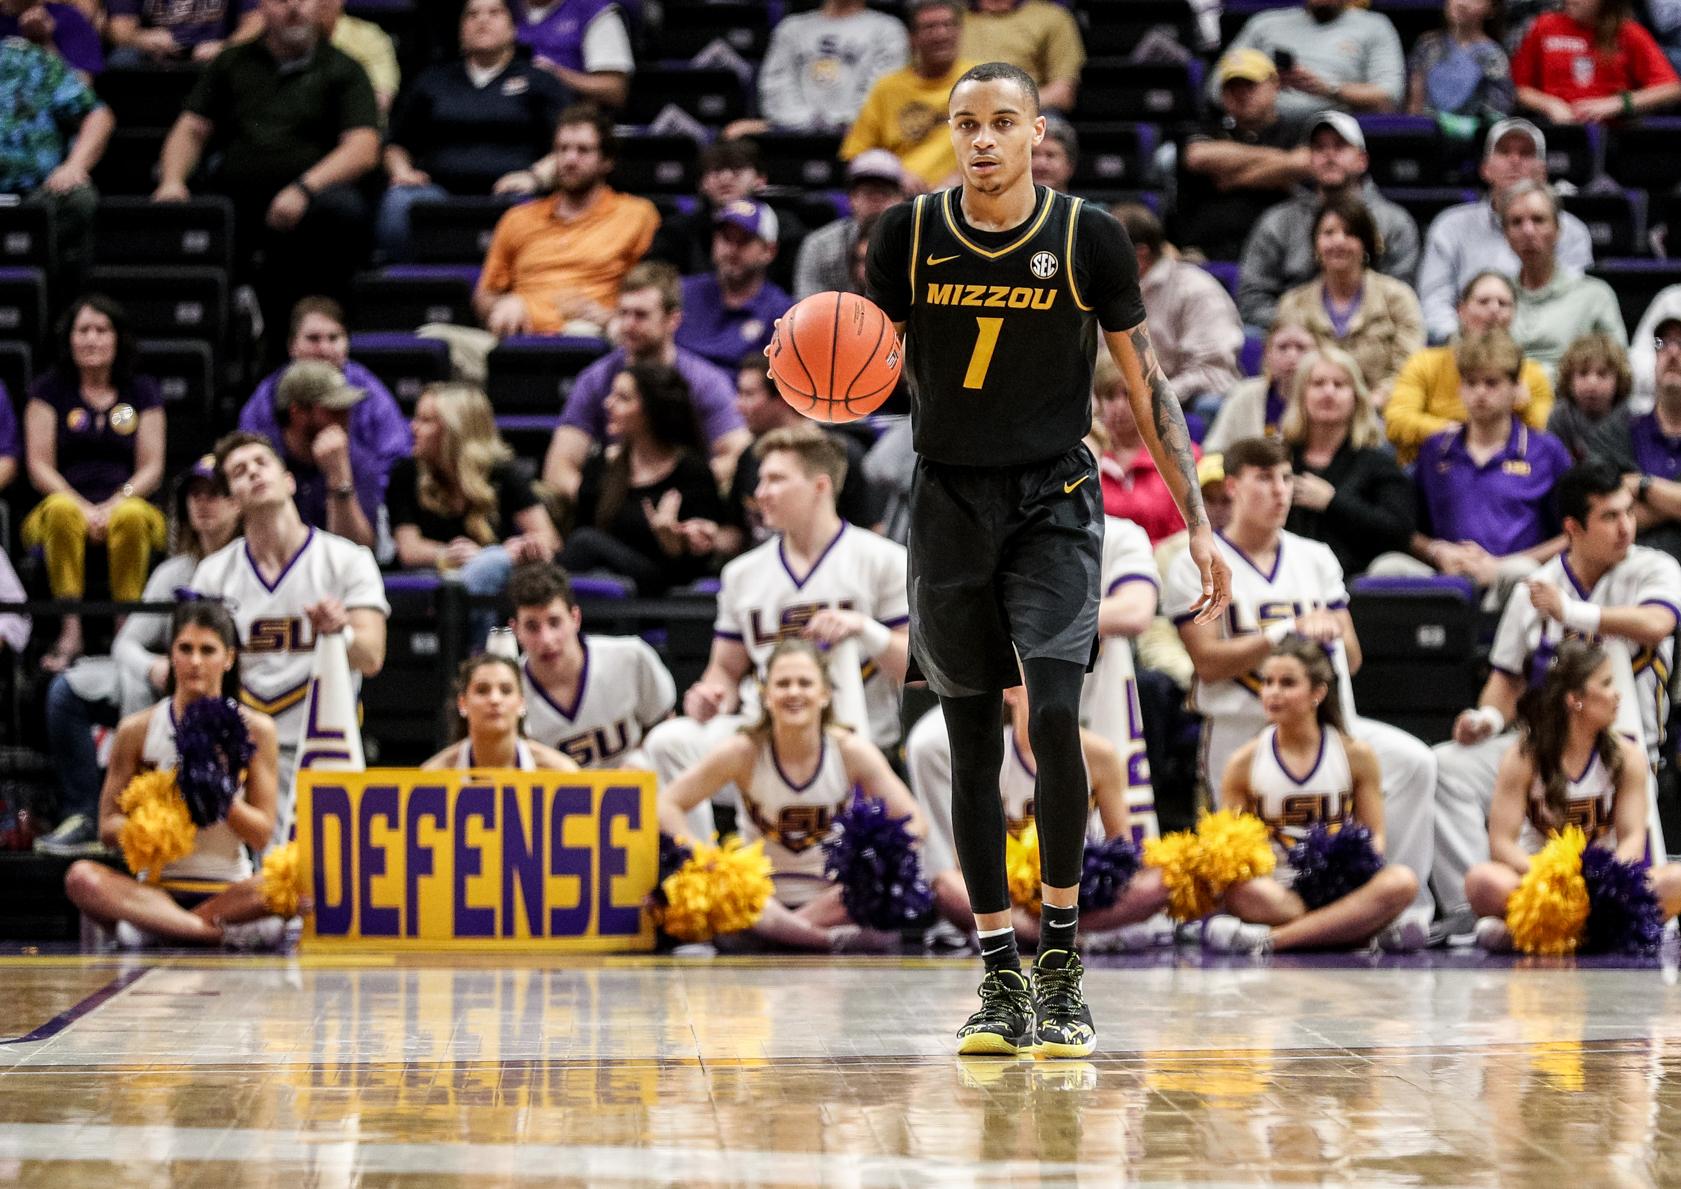 NCAA Basketball: Missouri at Louisiana State